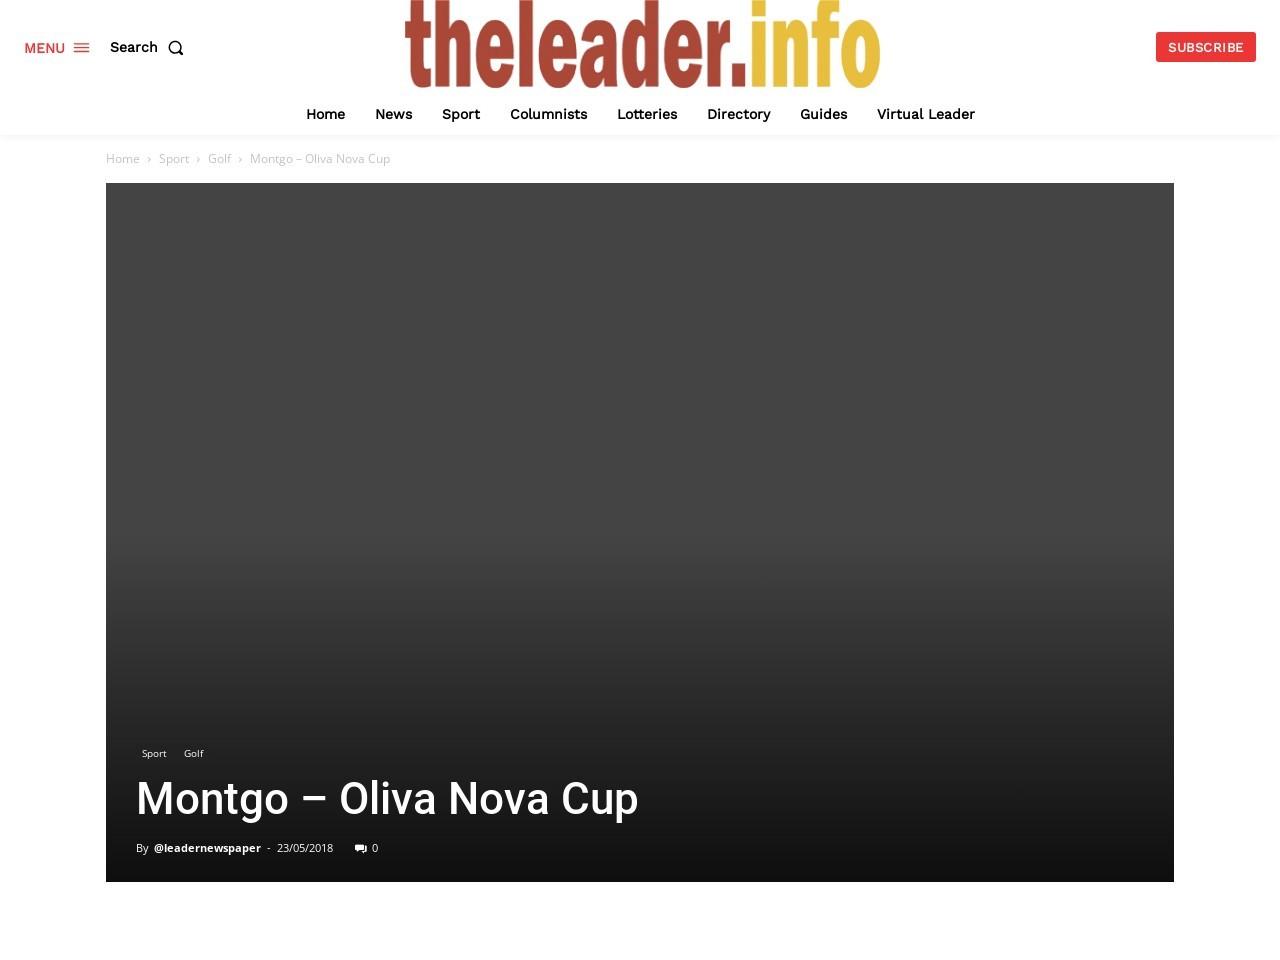 Montgo – Oliva Nova Cup